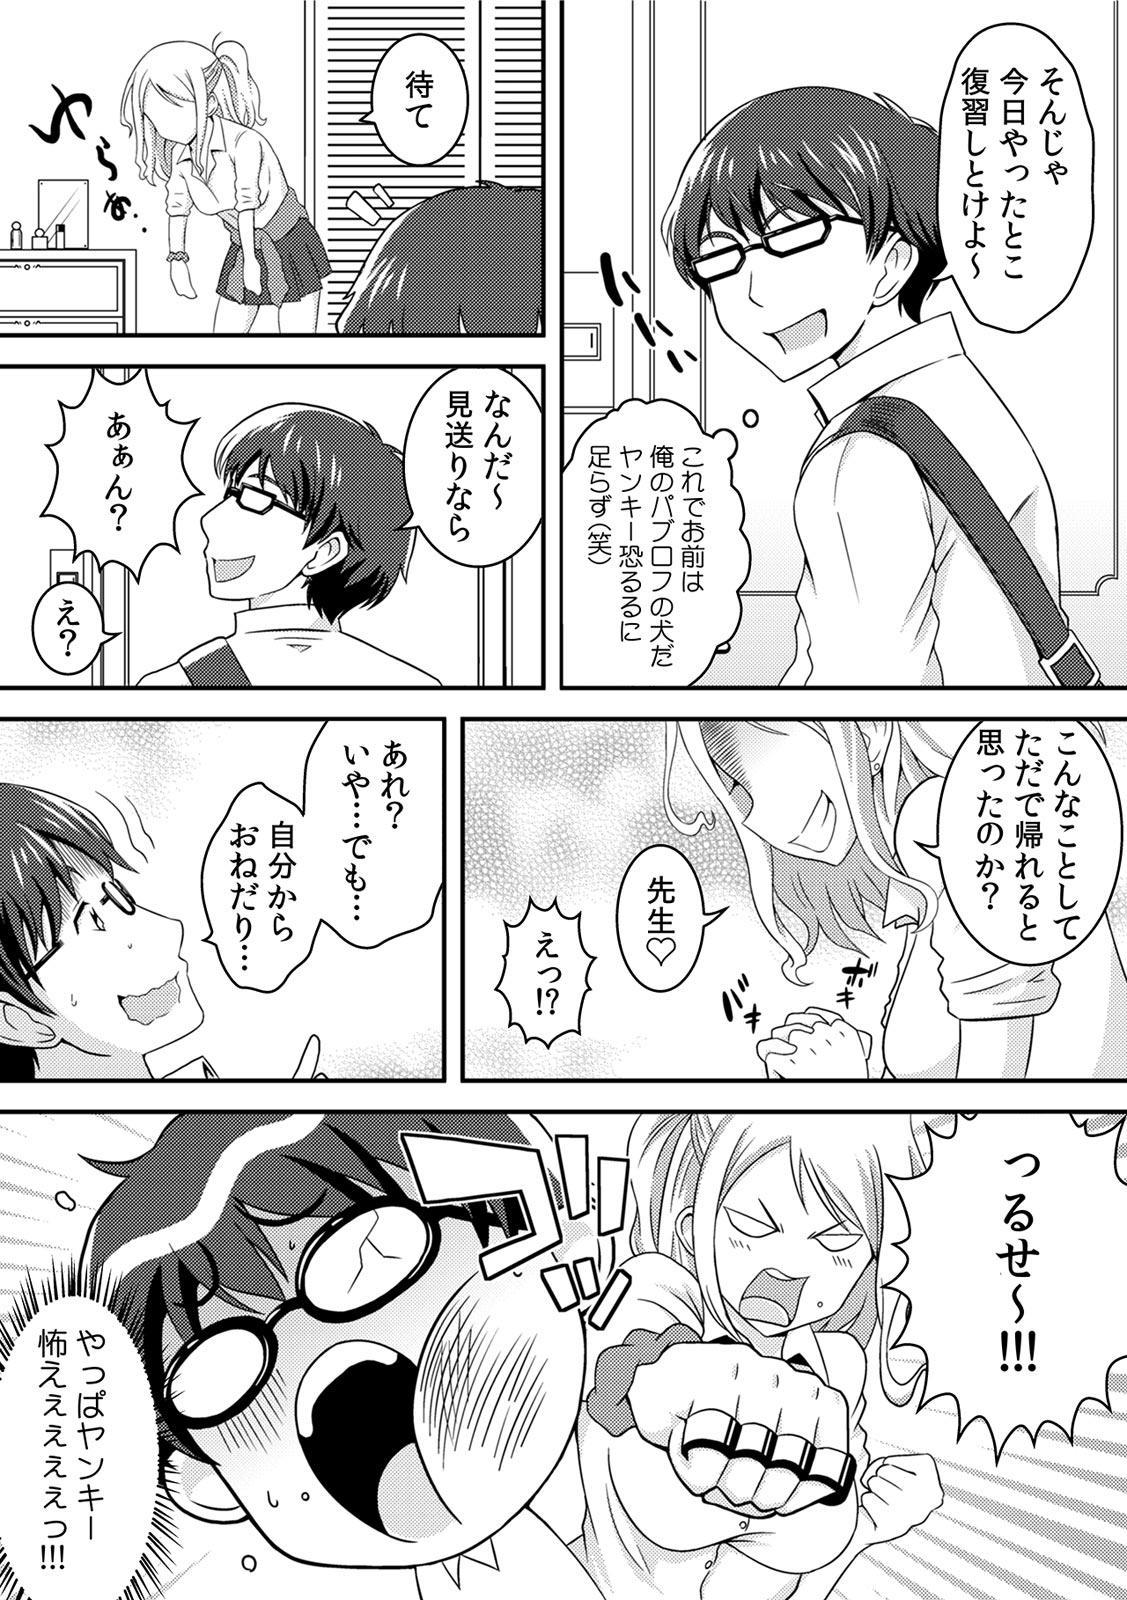 [Yuzu Ramune] Yankee Musume o Ecchi de Kousei!? ~Jugyou de Ijirare Shitagi ga Gusshori~ 1 17